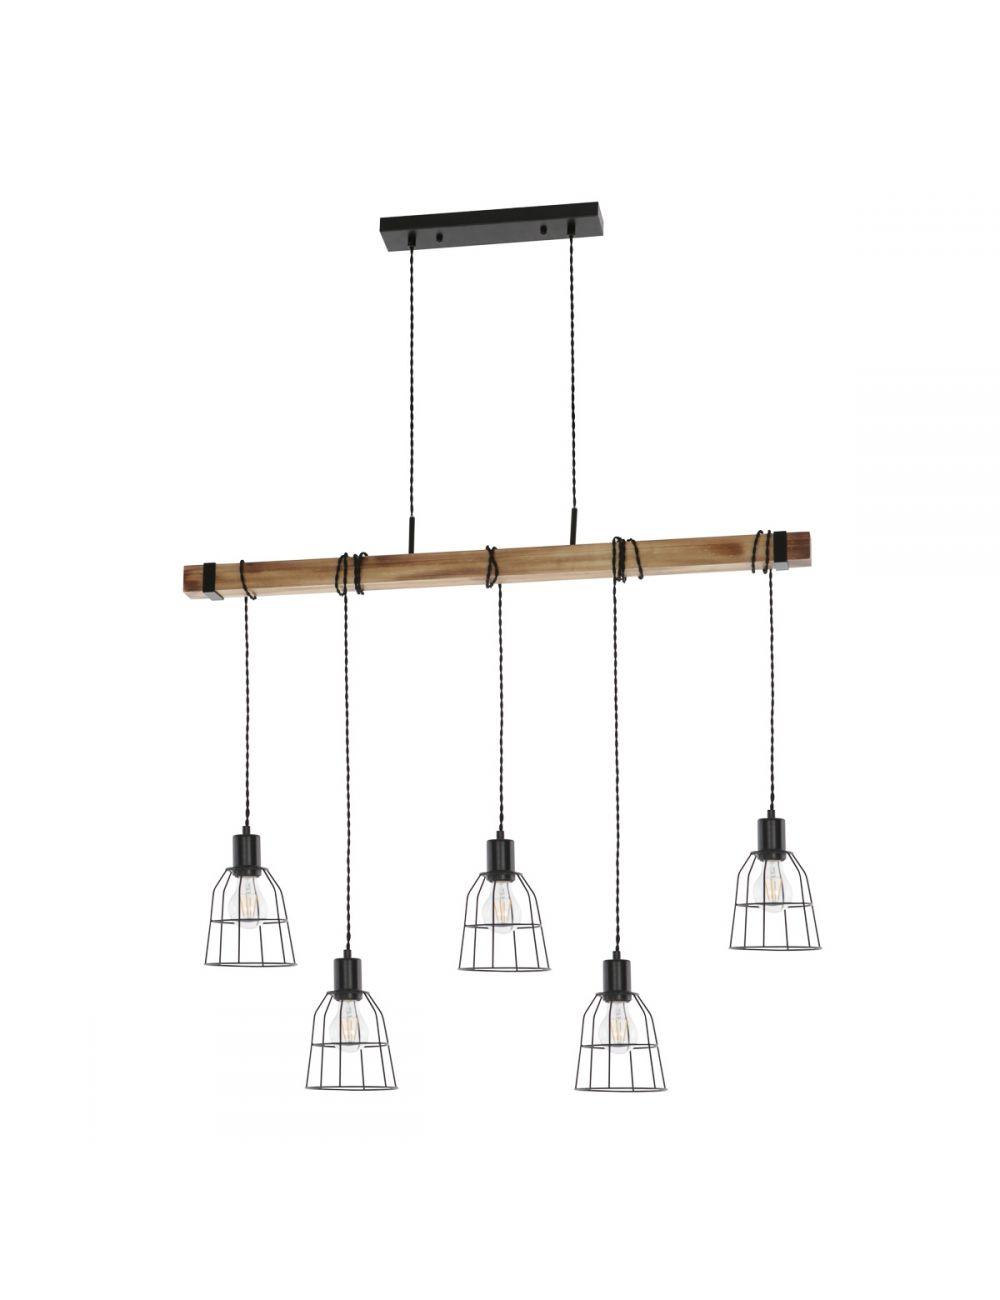 Lampa wisząca belka drewniana loft industrialna Ponte Italux PND-4290-5-L